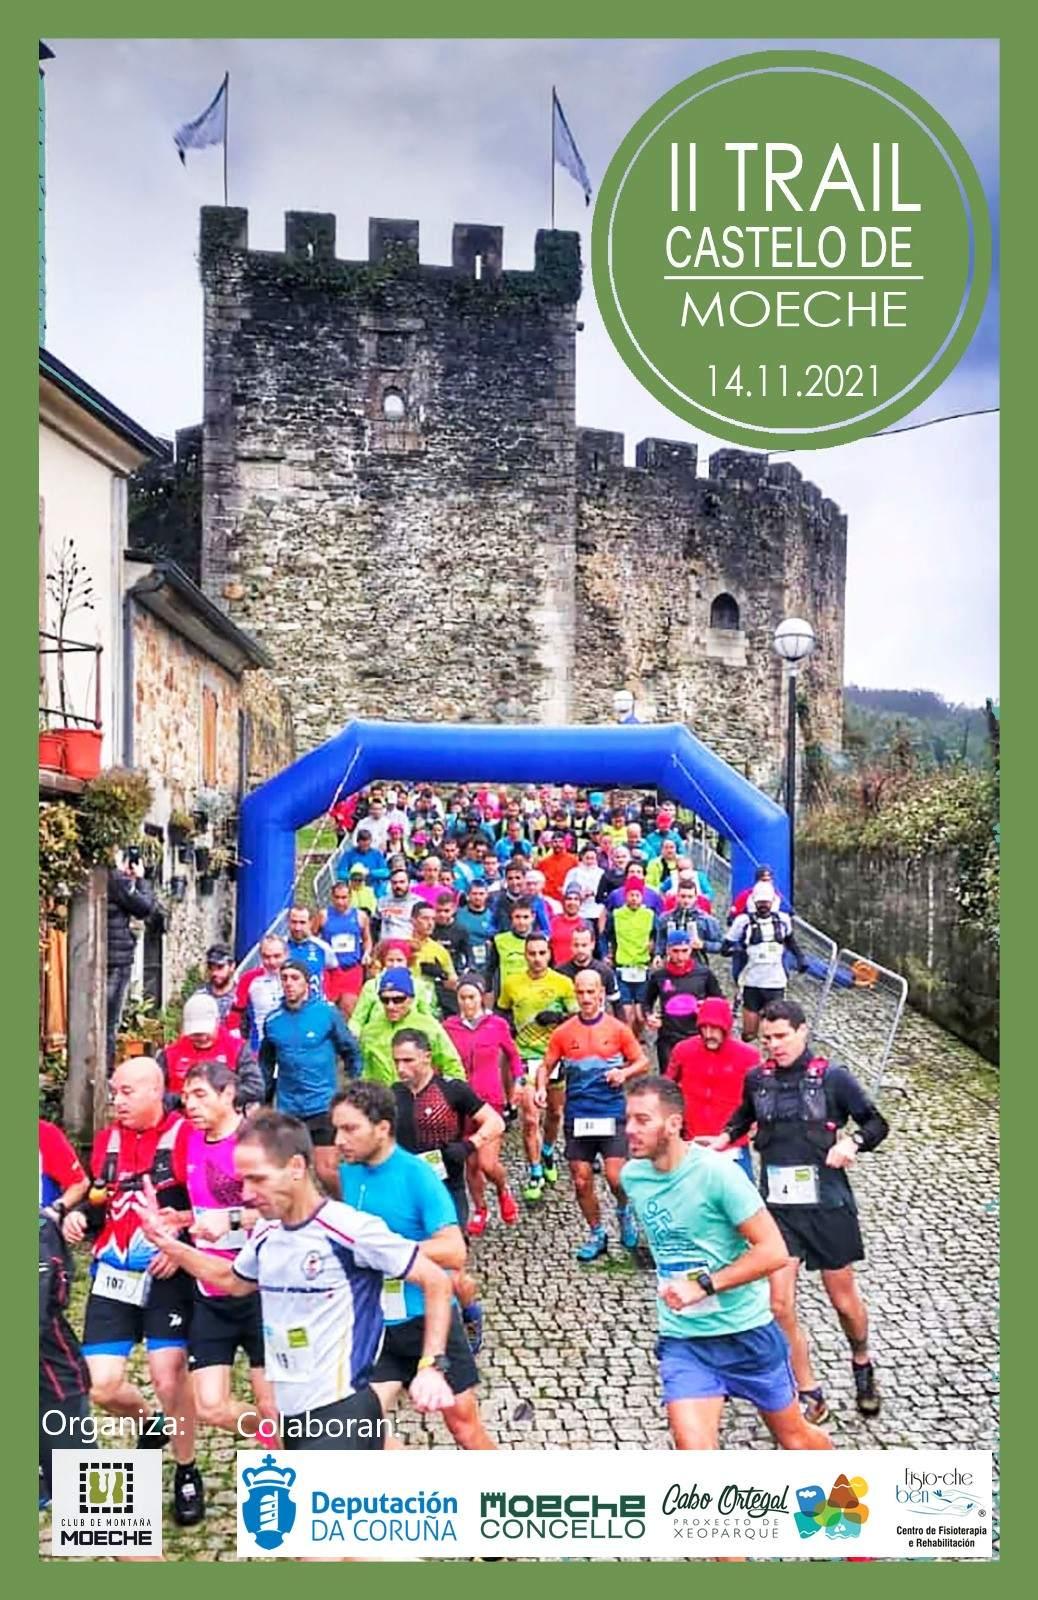 Event Poster II TRAIL CASTELO DE MOECHE